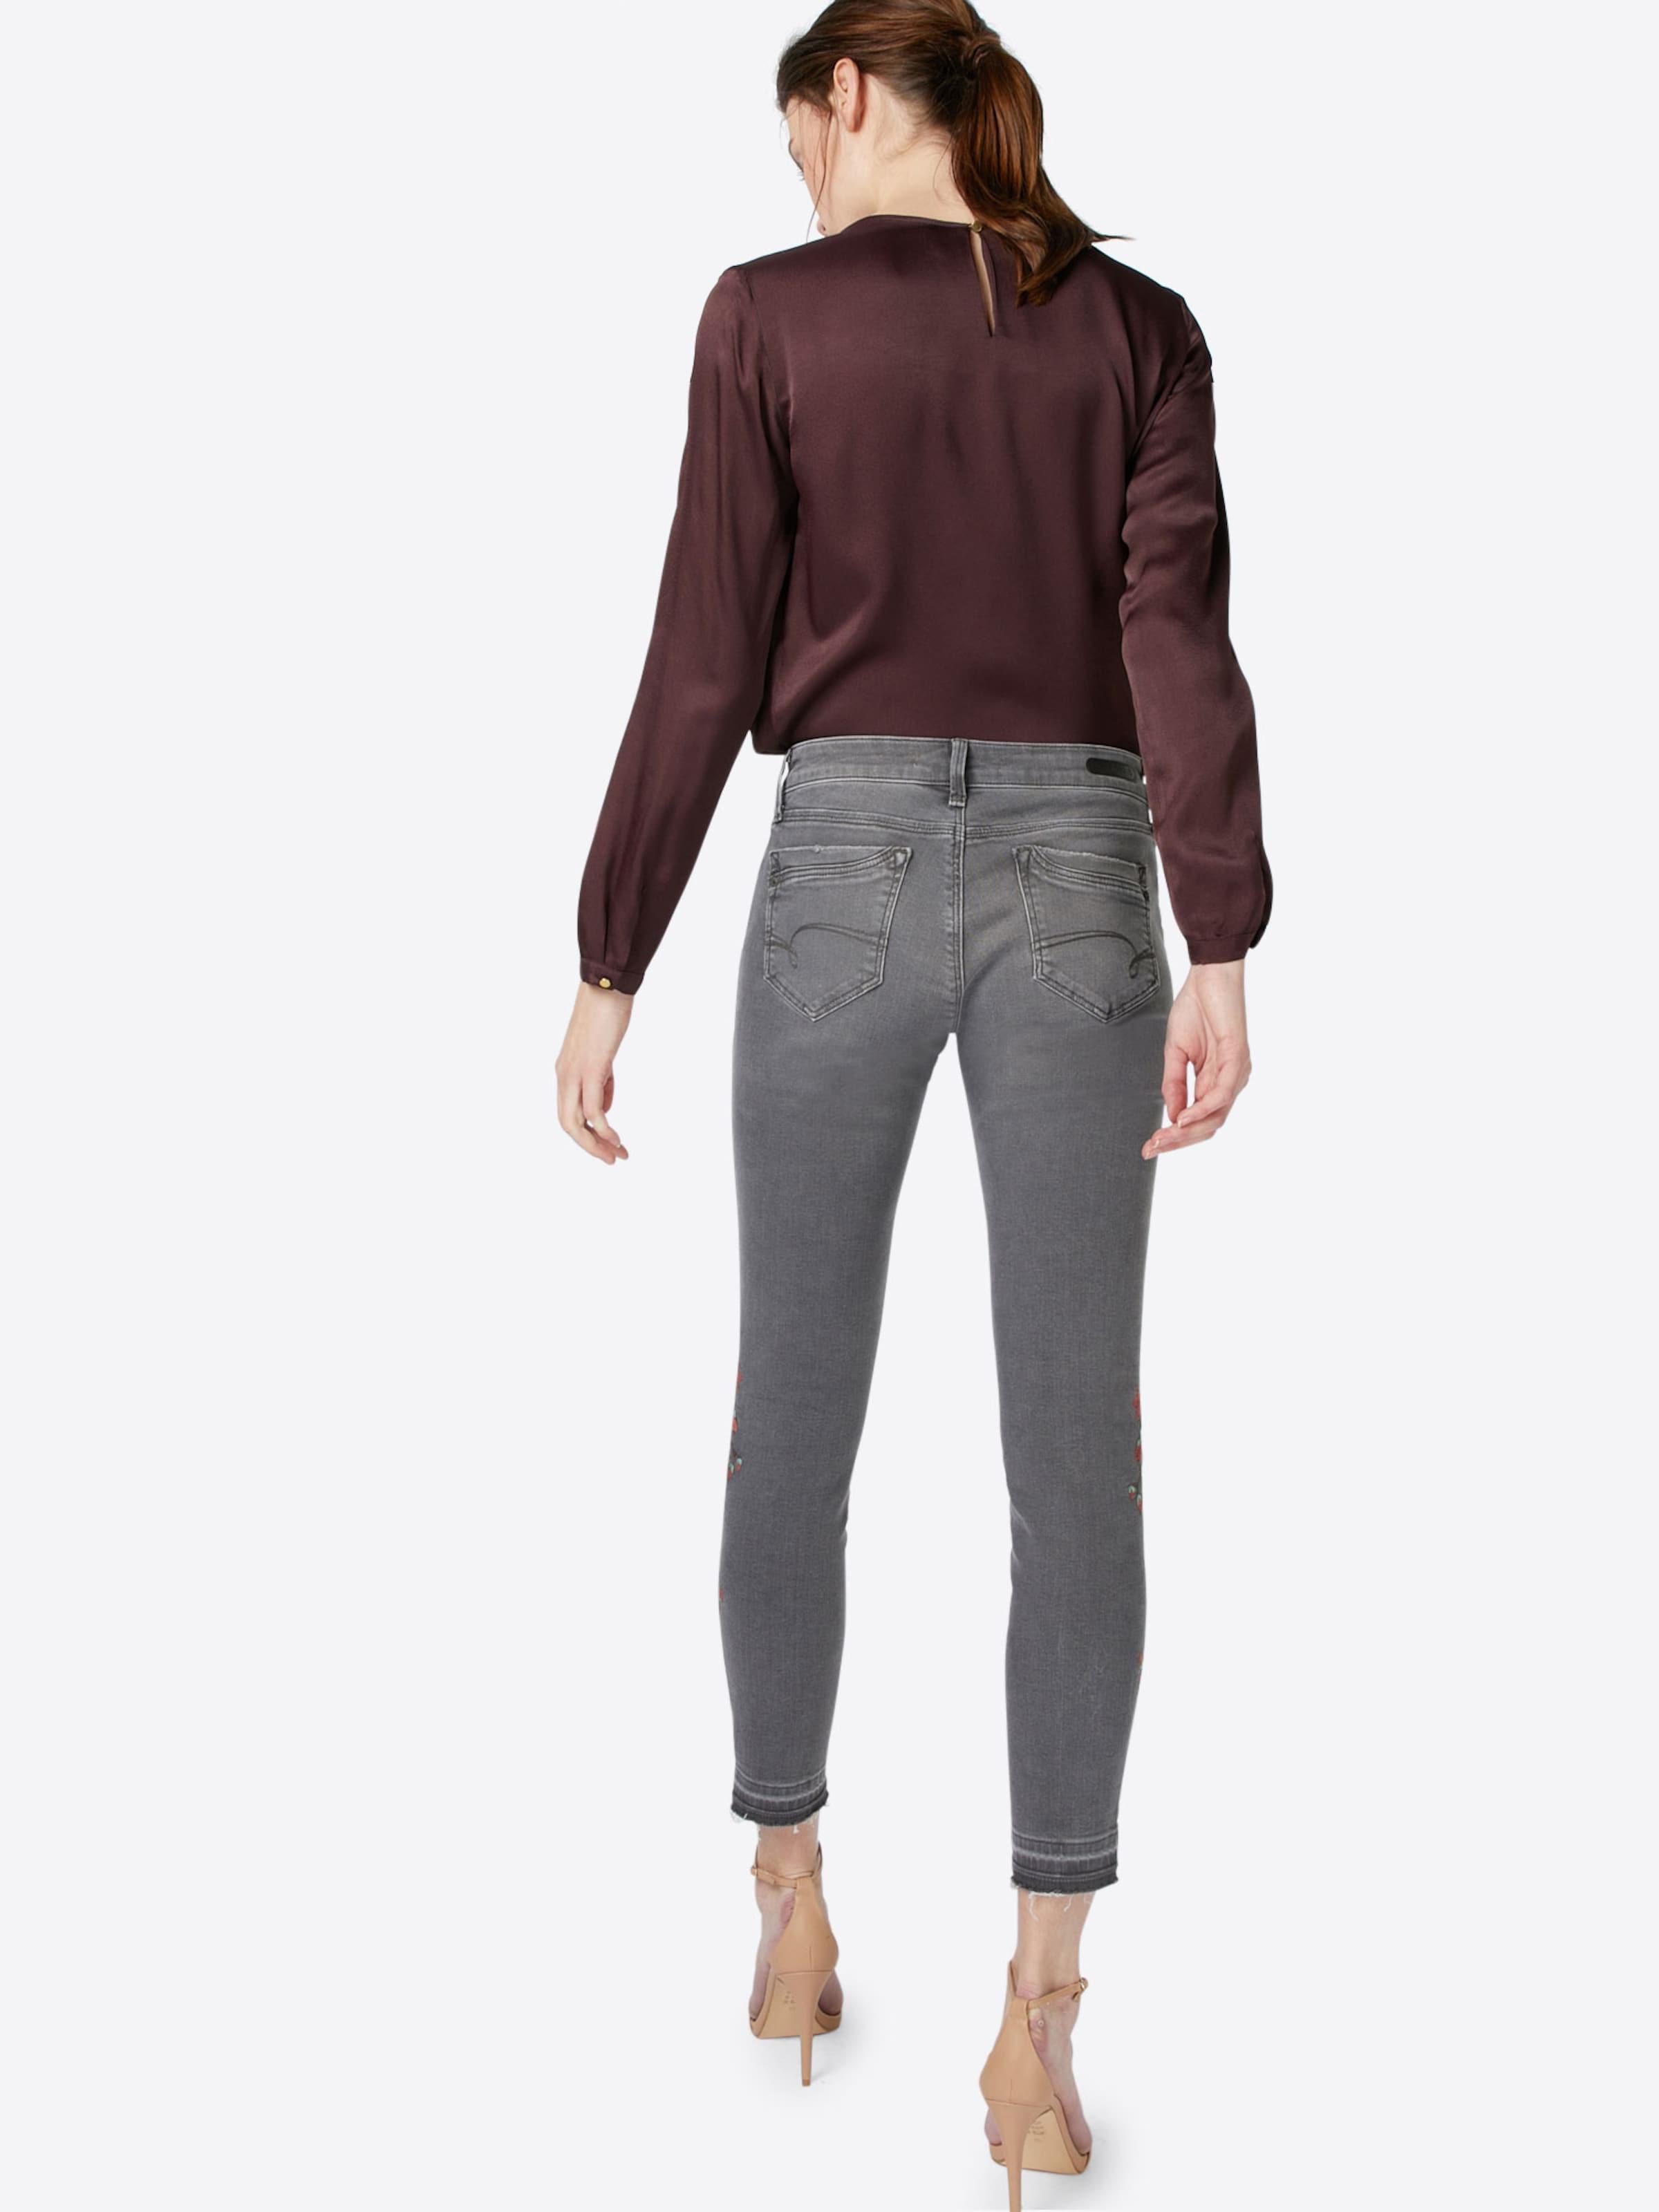 Bester Großhandelsverkauf Online Bester Ort Zum Verkauf Mavi Ankle-Jeans 'Adriana' fIIkU